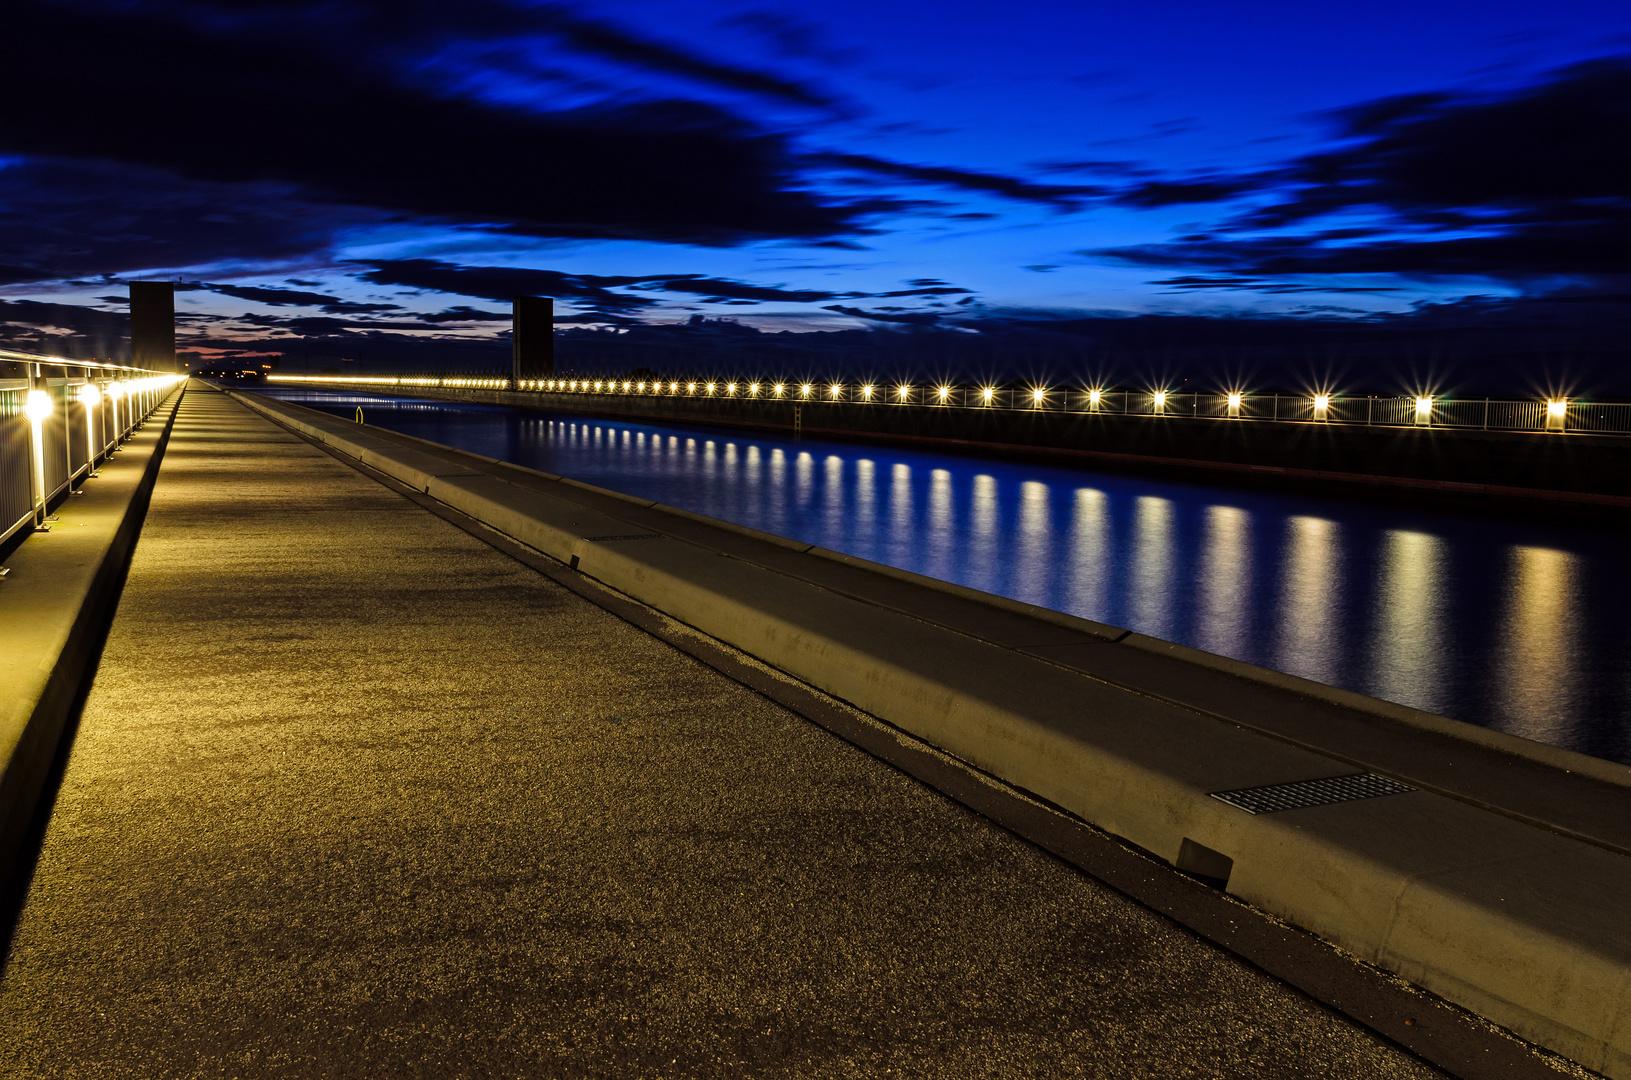 Abends an der Trogbrücke bei Magdeburg